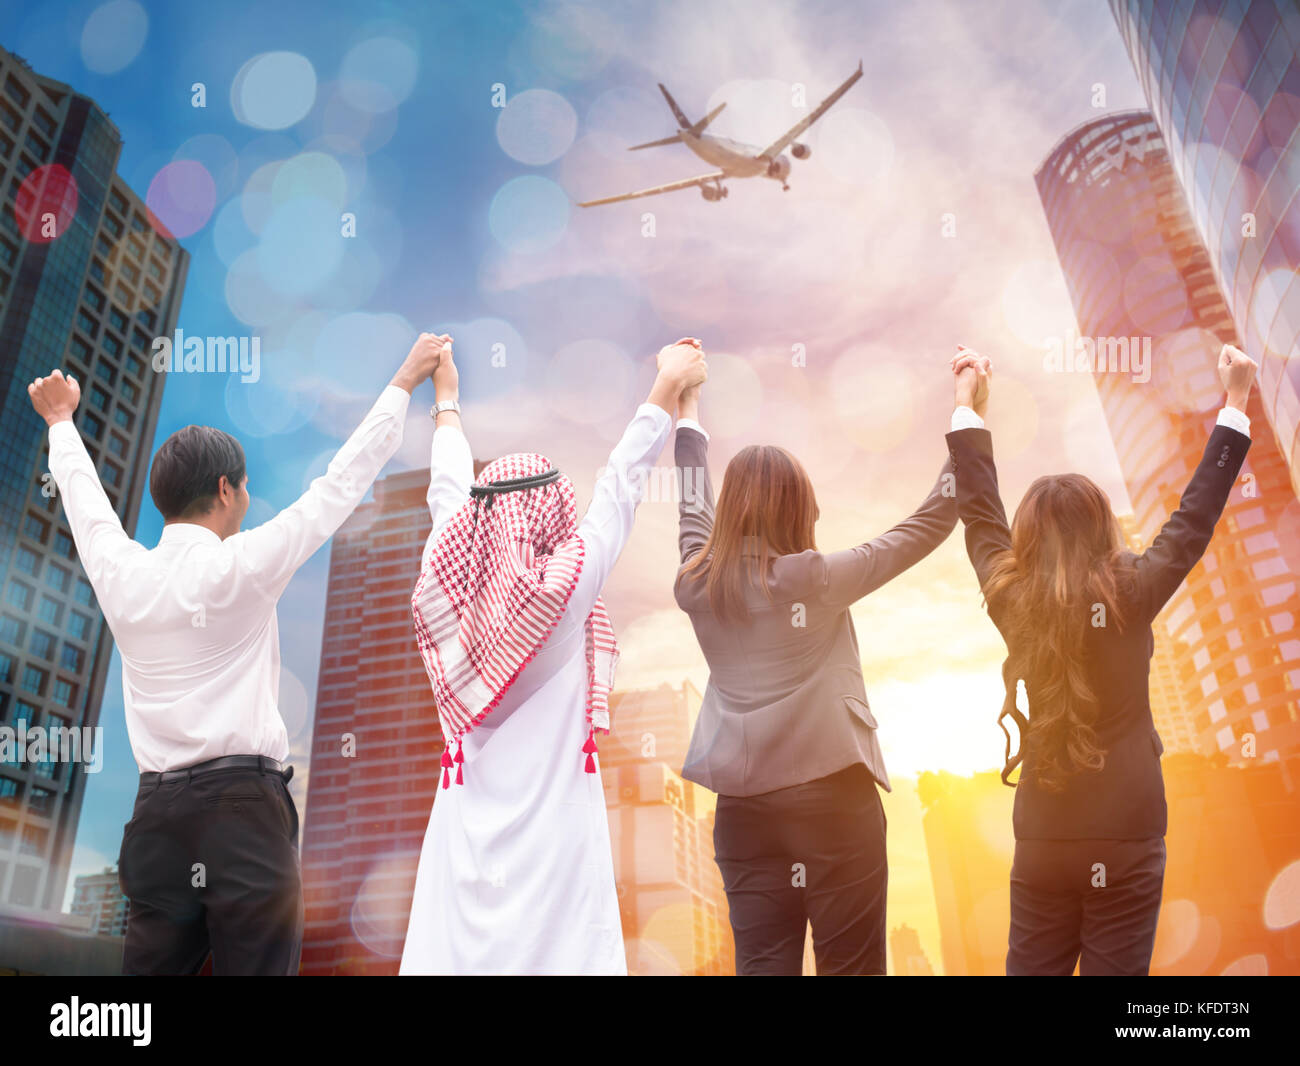 Cuatro empresarios que mano alta por línea aérea comercial.Business exitoso concepto, concepto de trabajo Imagen De Stock